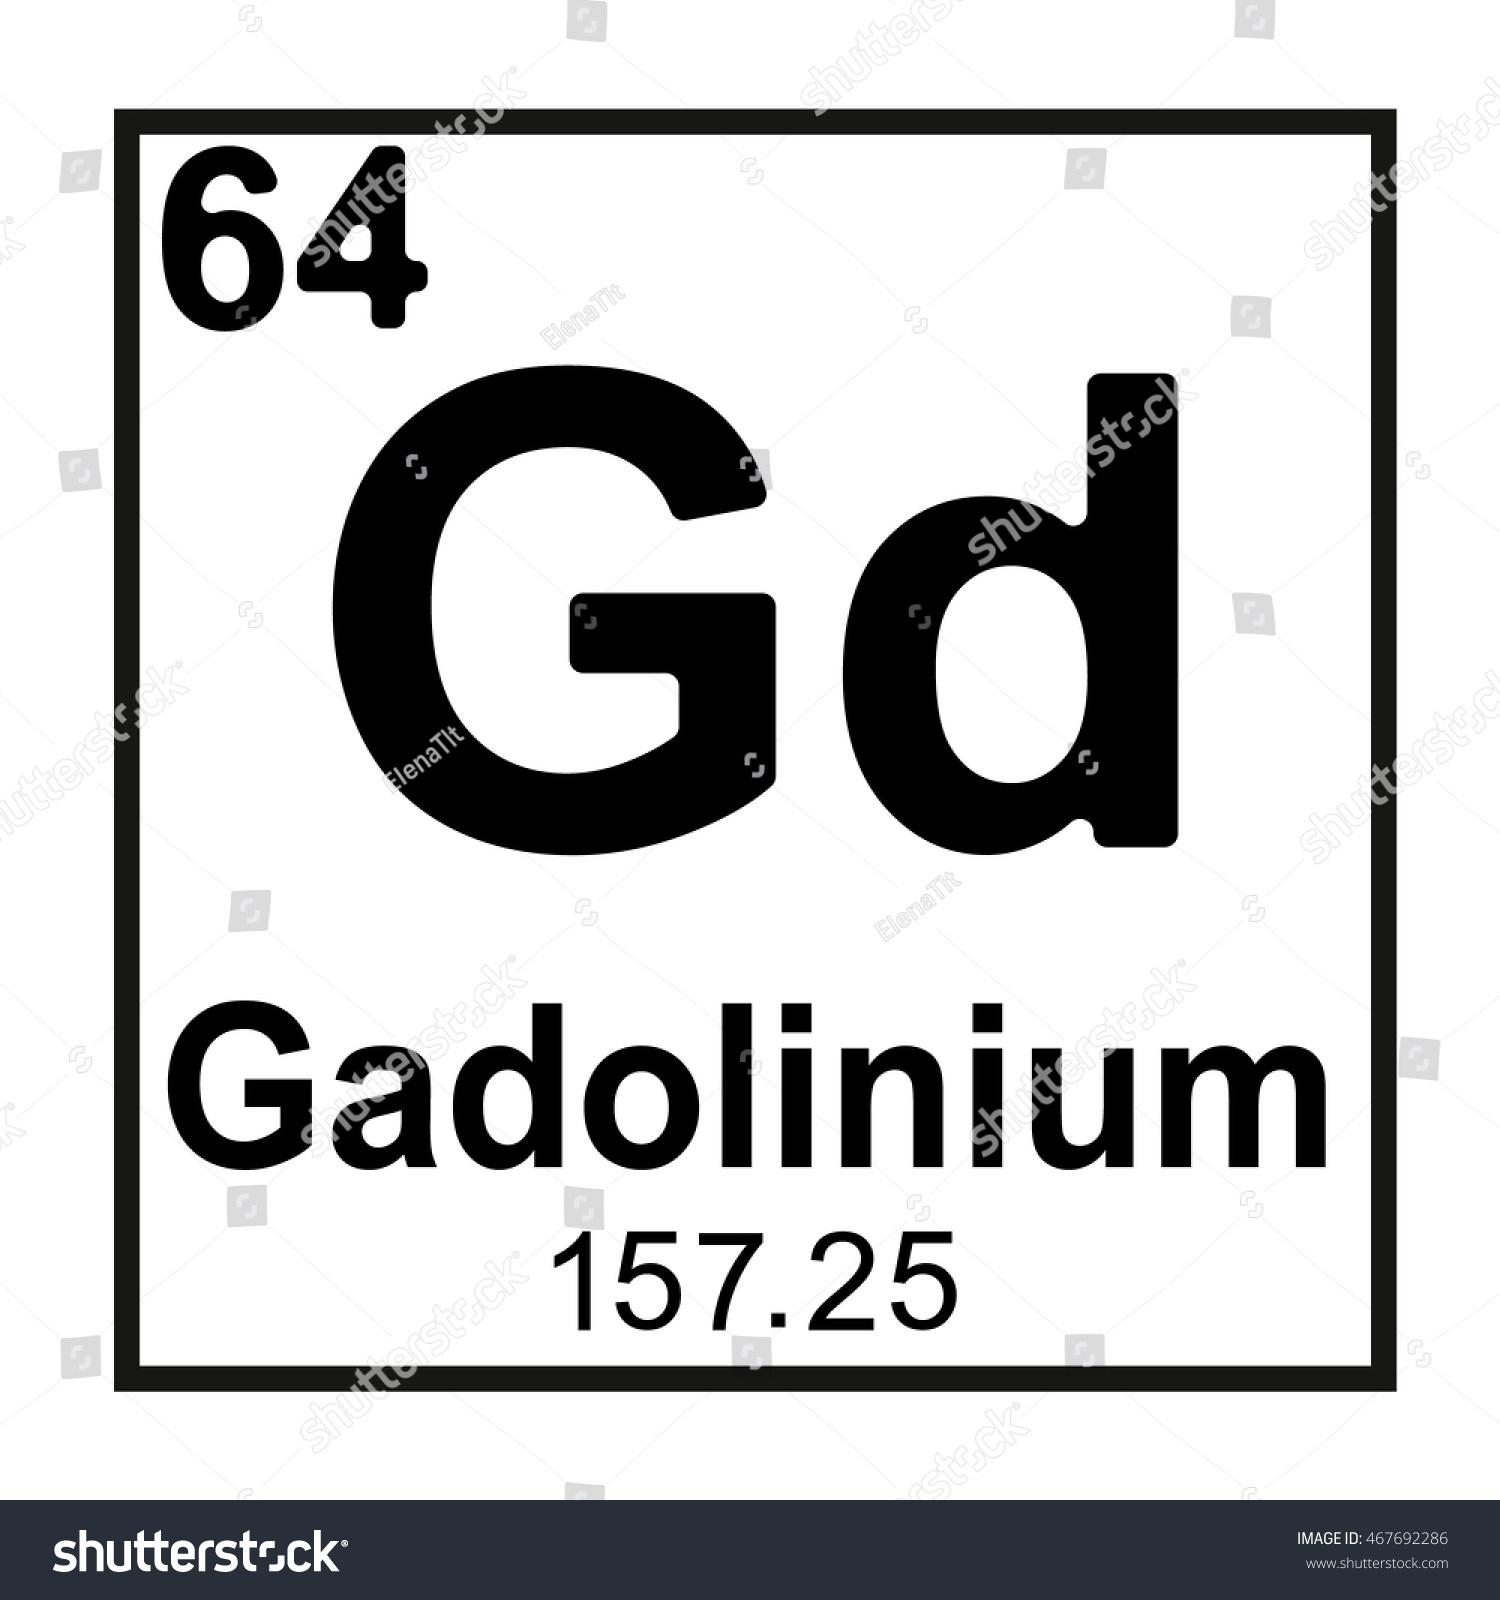 Periodic table element gadolinium stock vector 467692286 periodic table element gadolinium gamestrikefo Image collections